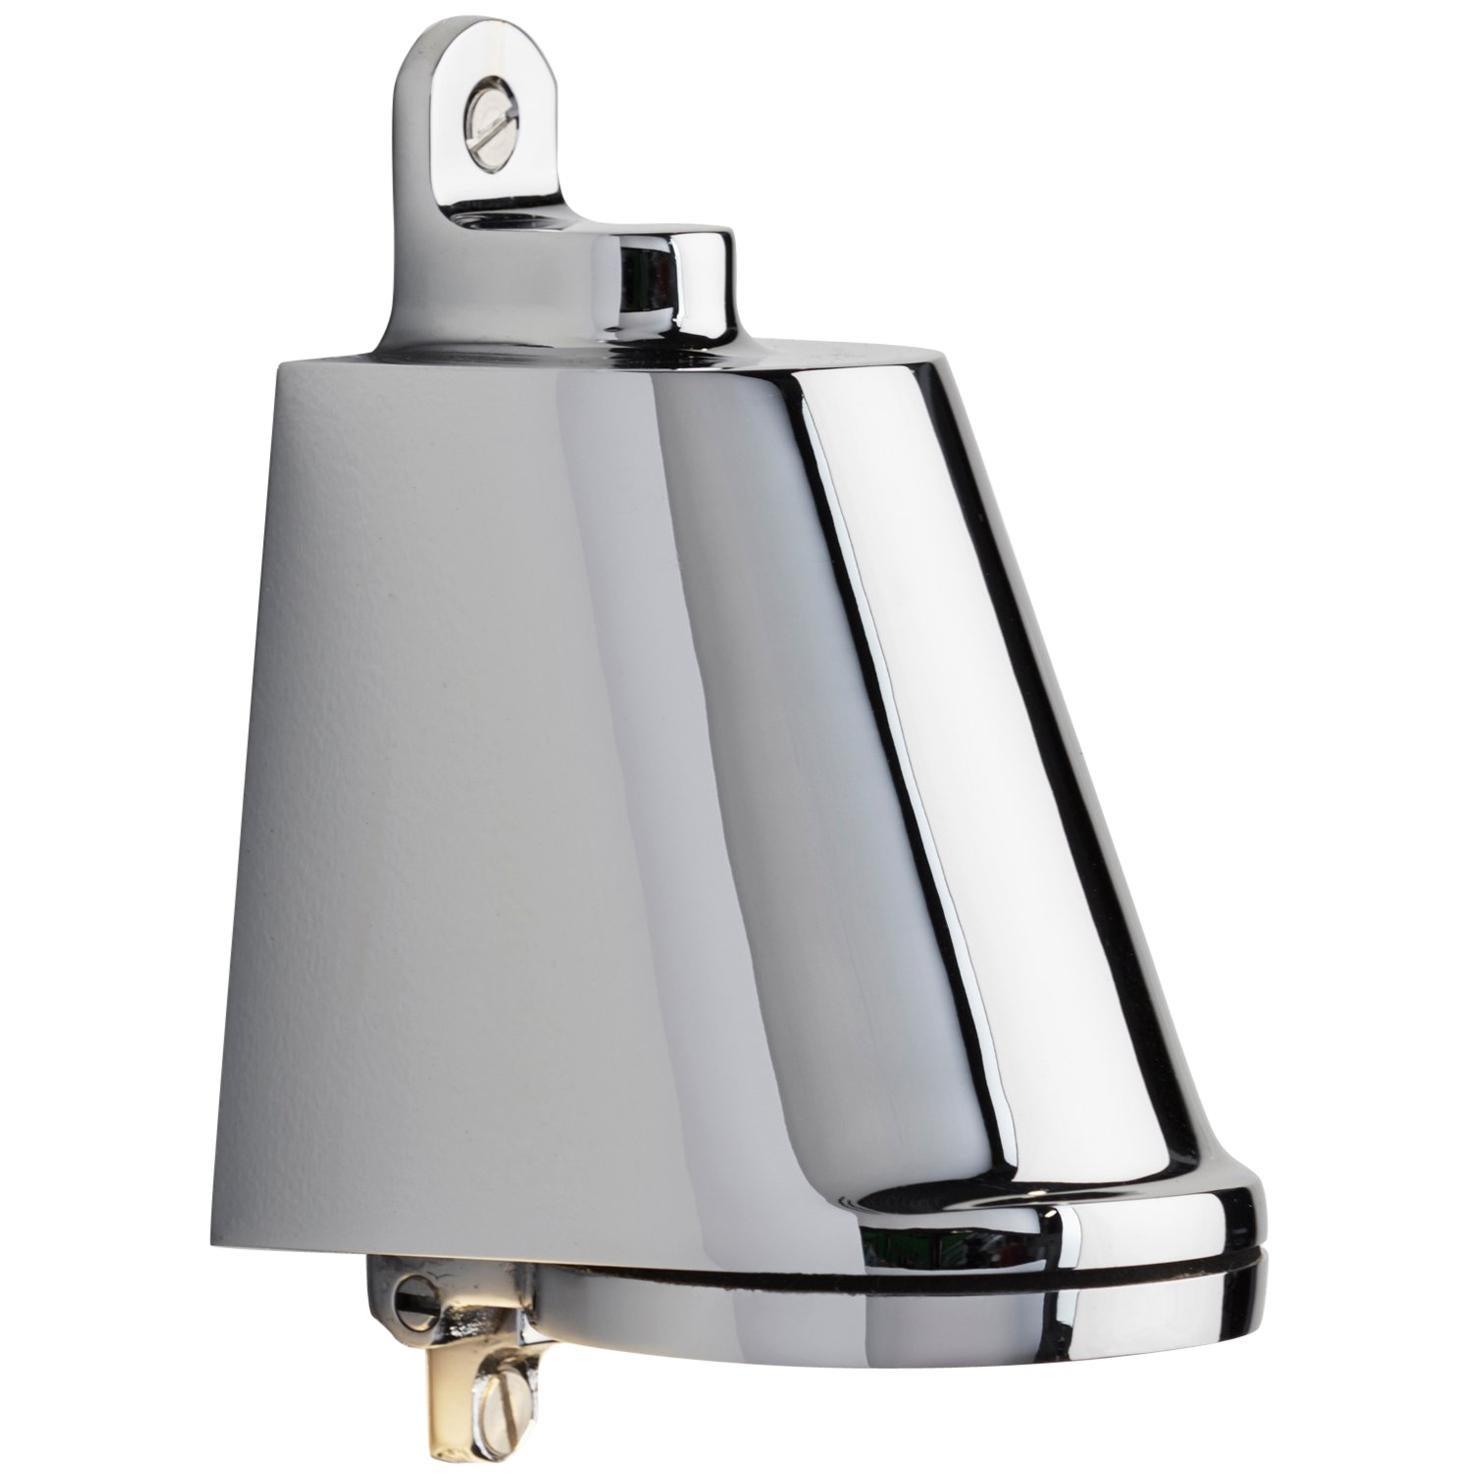 Tekna Spreaderlight 230V LED Wall Light with Polished Chrome Finish